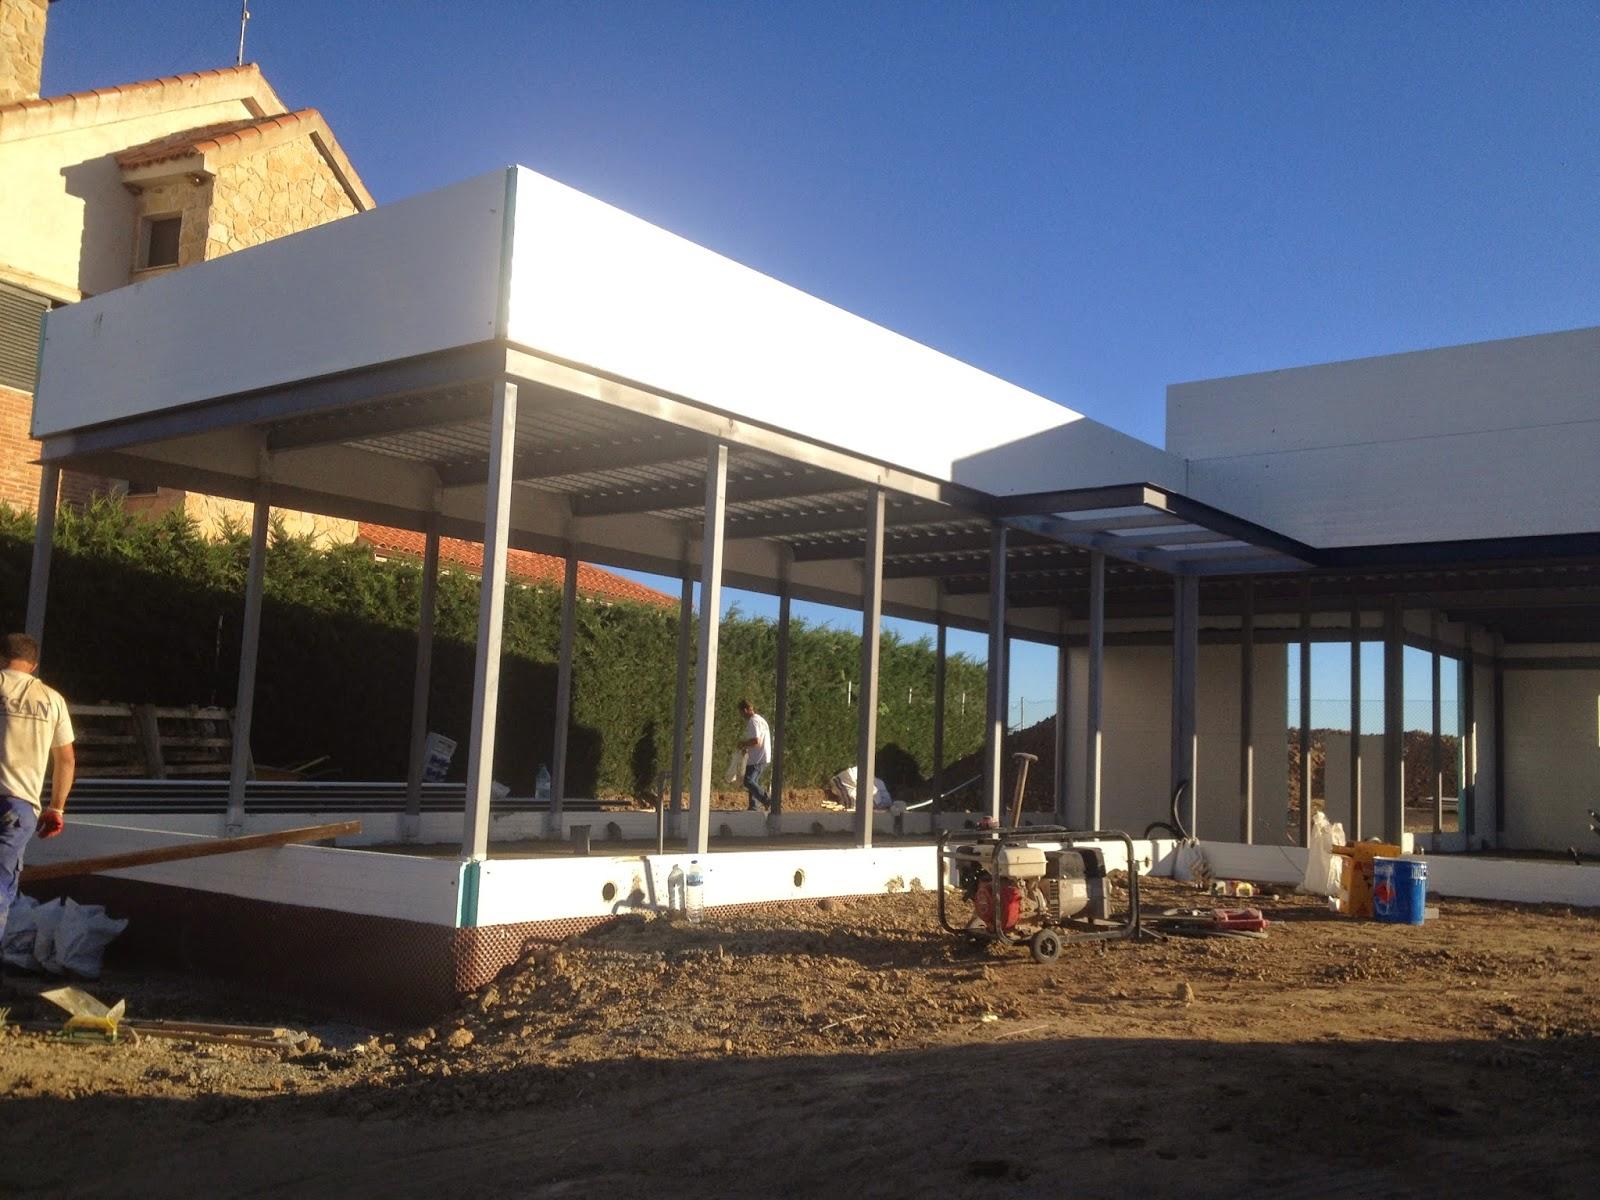 cerramiento-cubierta-viviendas-modulares